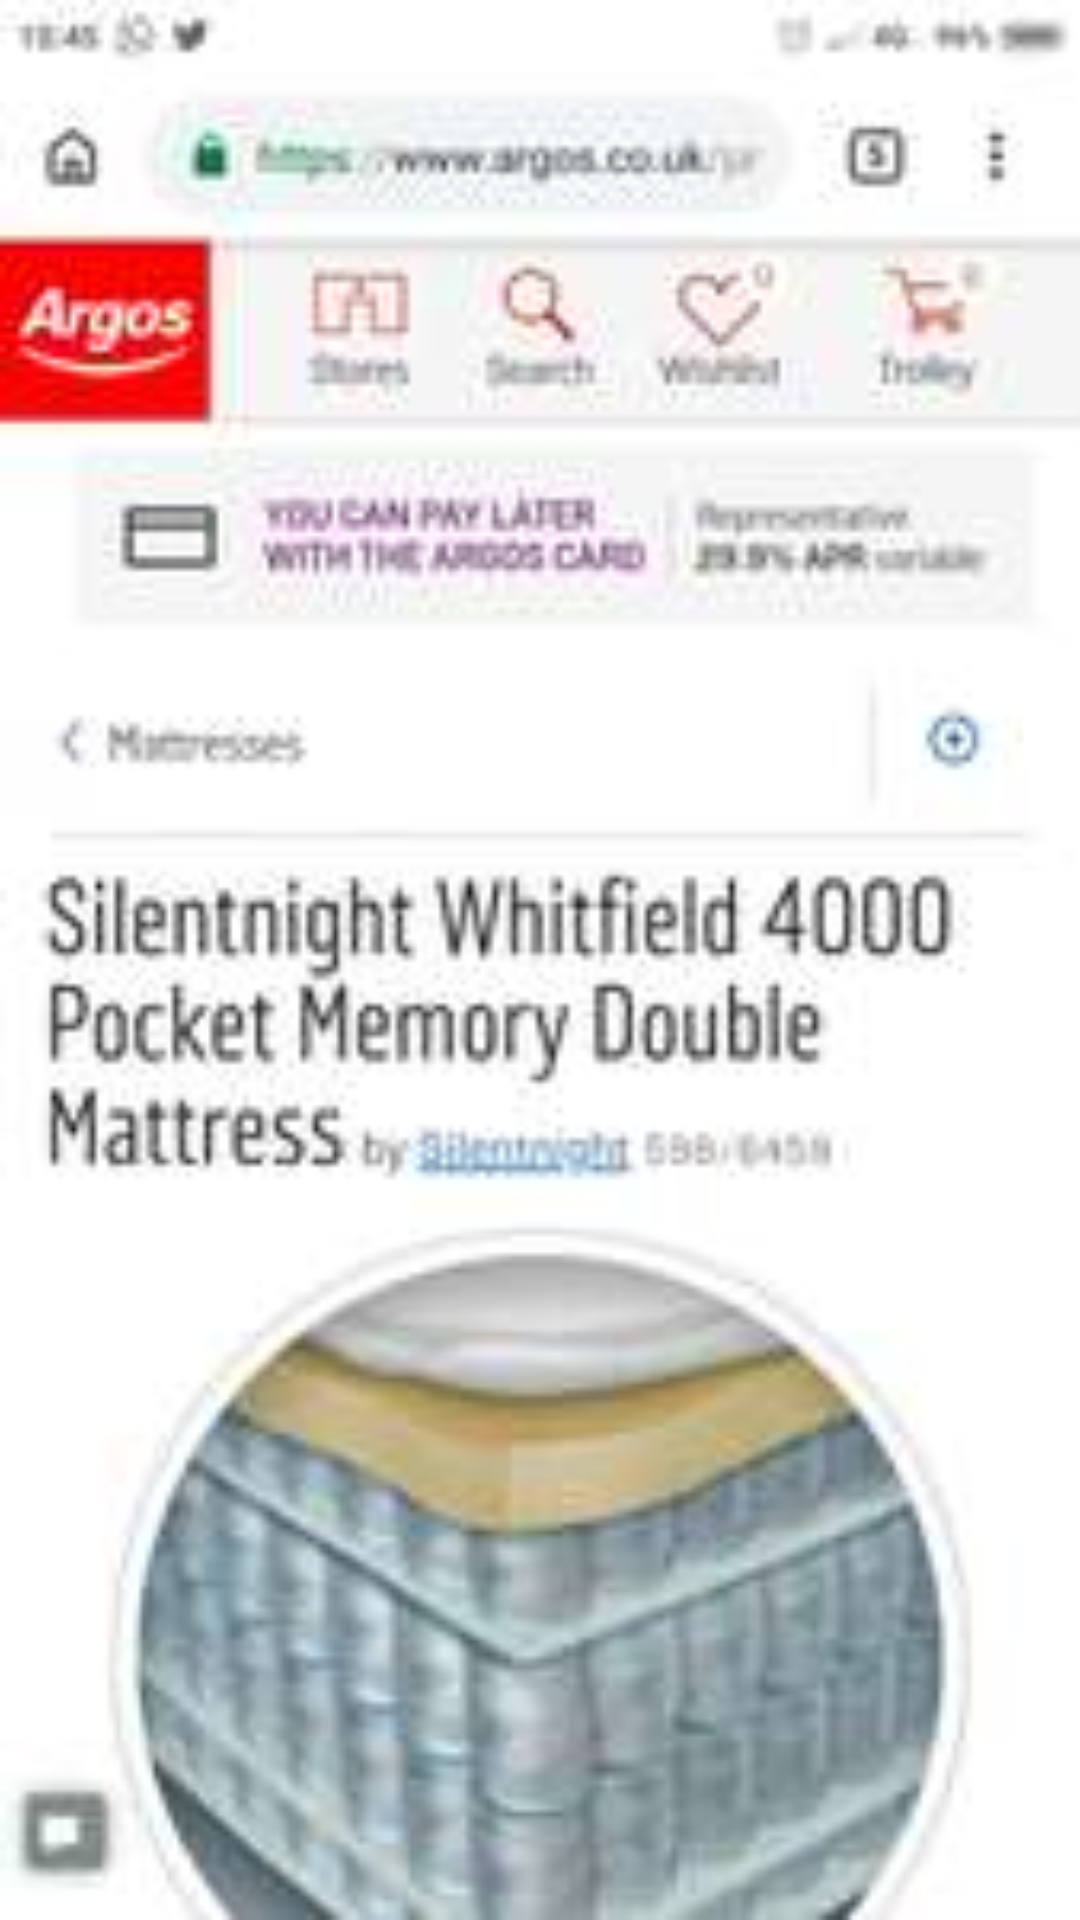 Silentnight Whitfield 4000 pocket memory mattress double £431 @ Argos